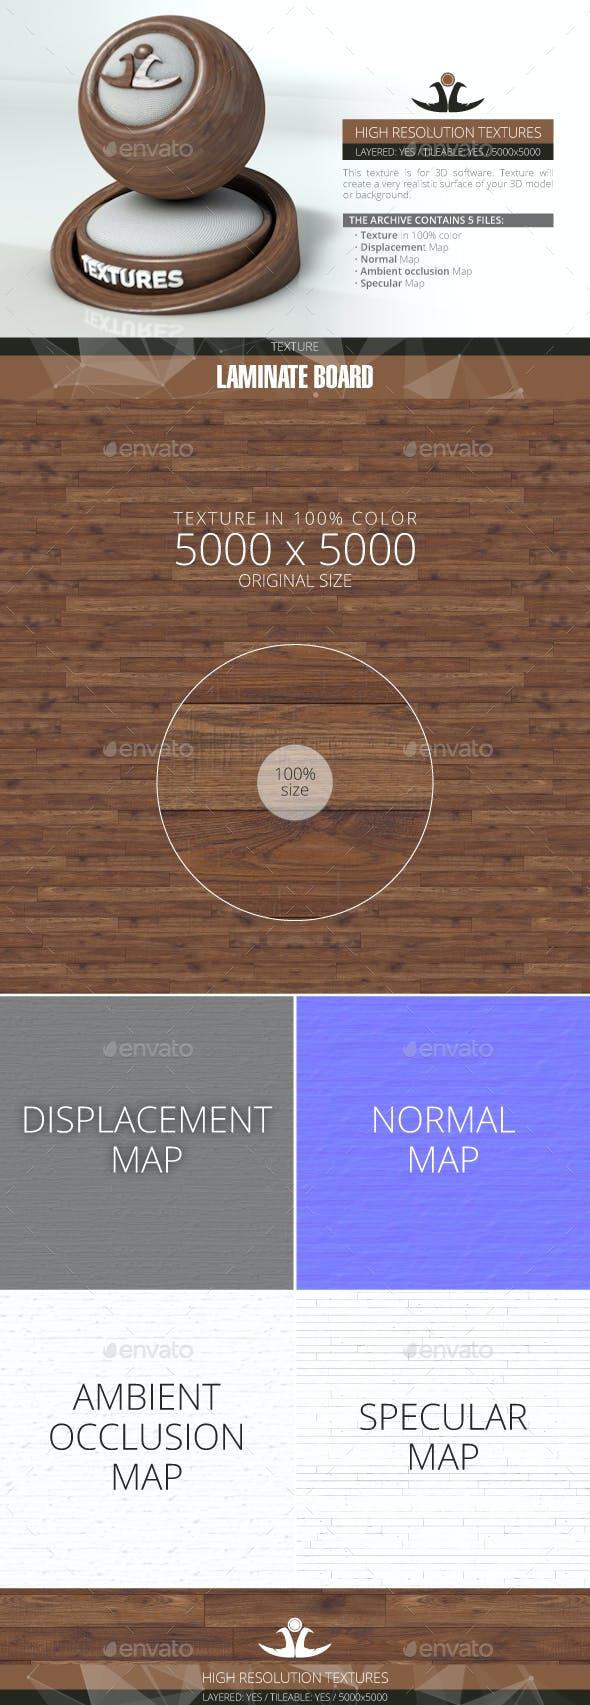 Laminate Board 24 - 3DOcean Item for Sale